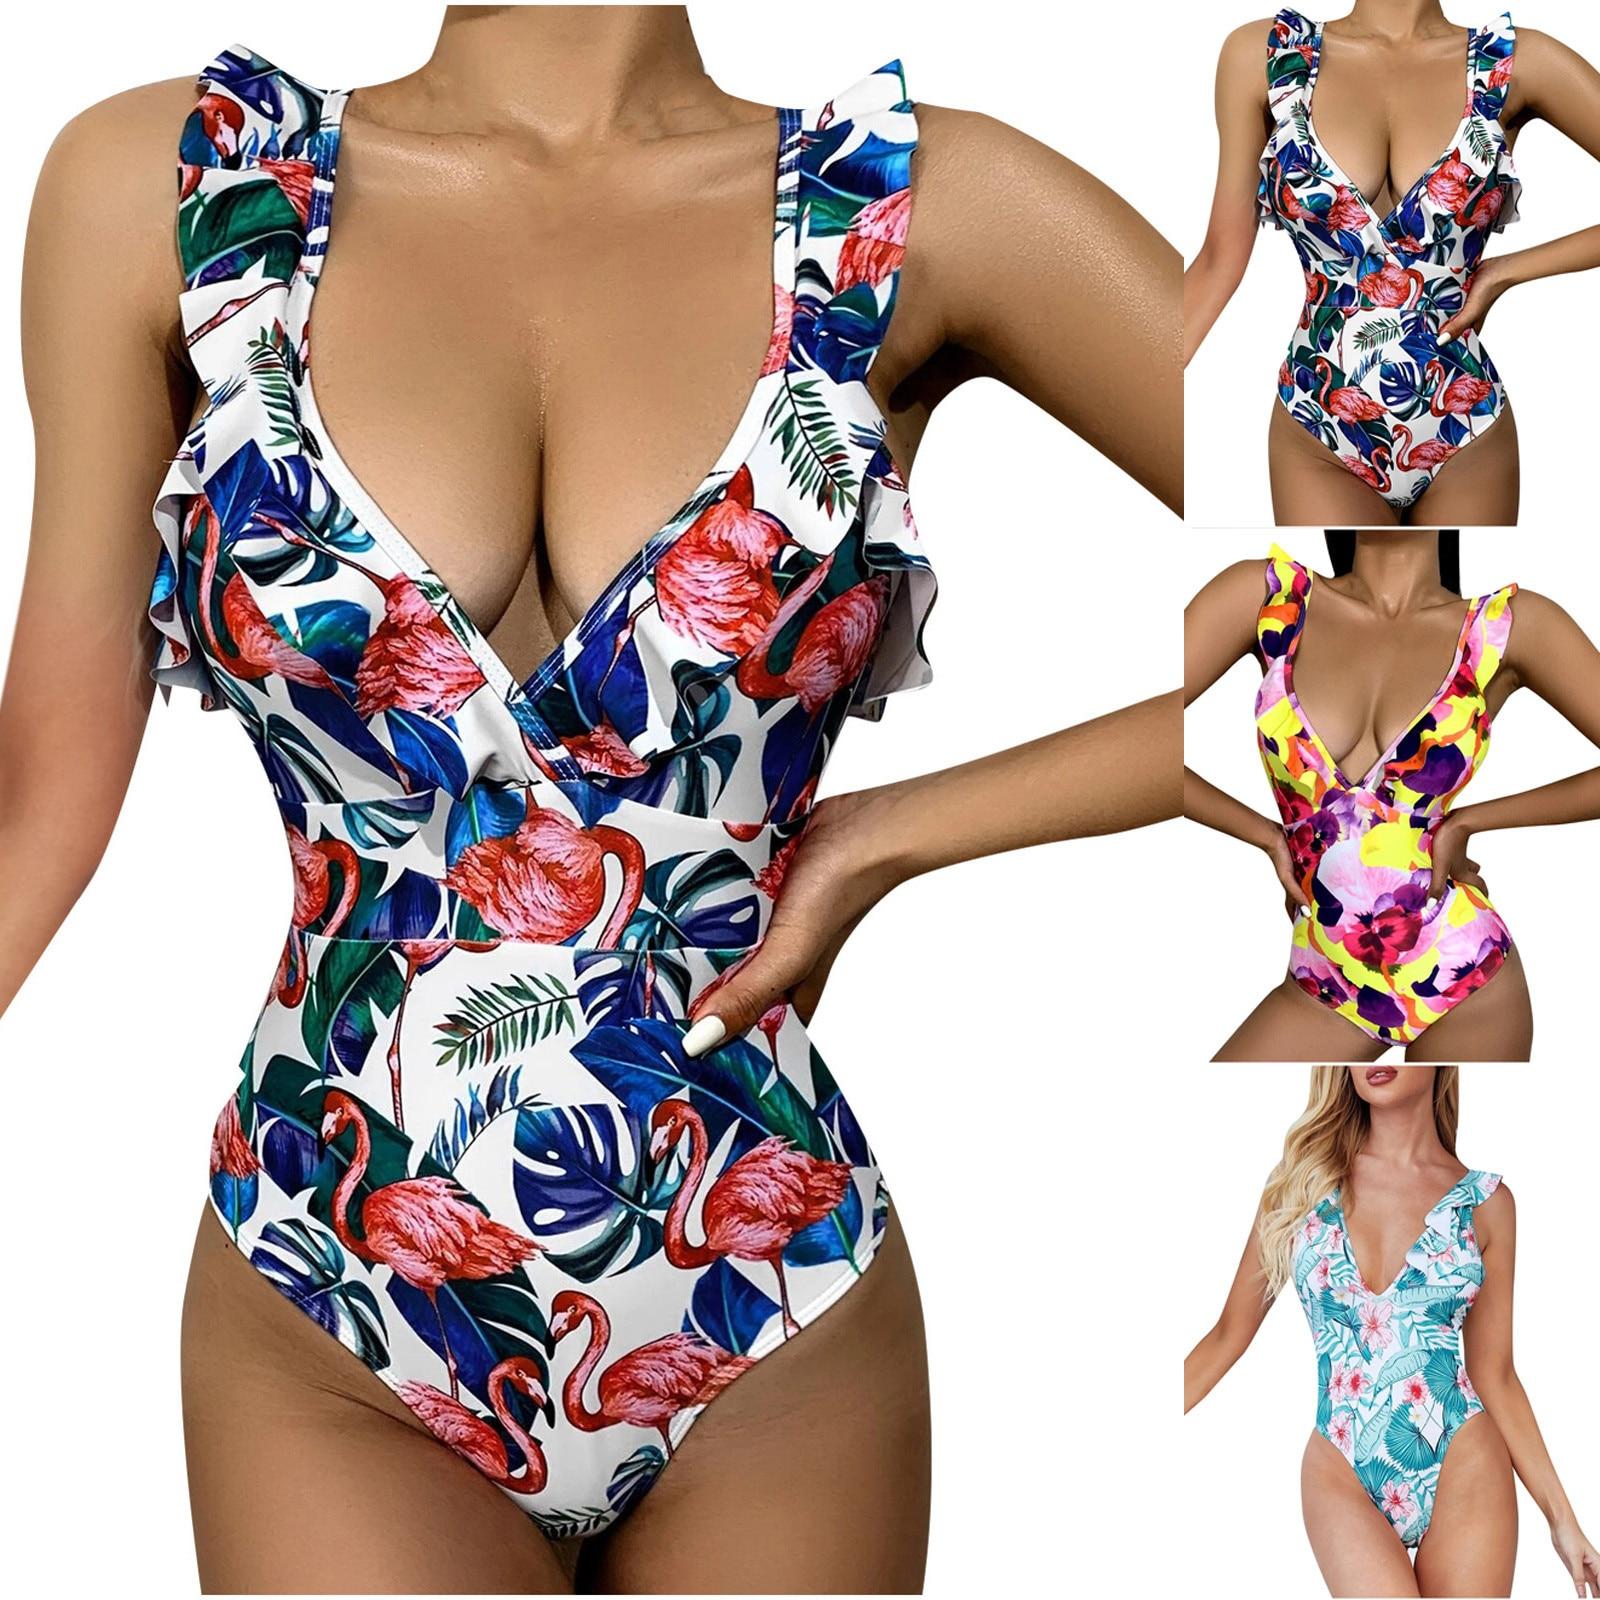 Swimsuit Sexy One Piece Fashion Women Swimwear V-Neck Printing Ruffle Siamese Swimsuit Bikini Swimming Suit bañadores mujer 2021